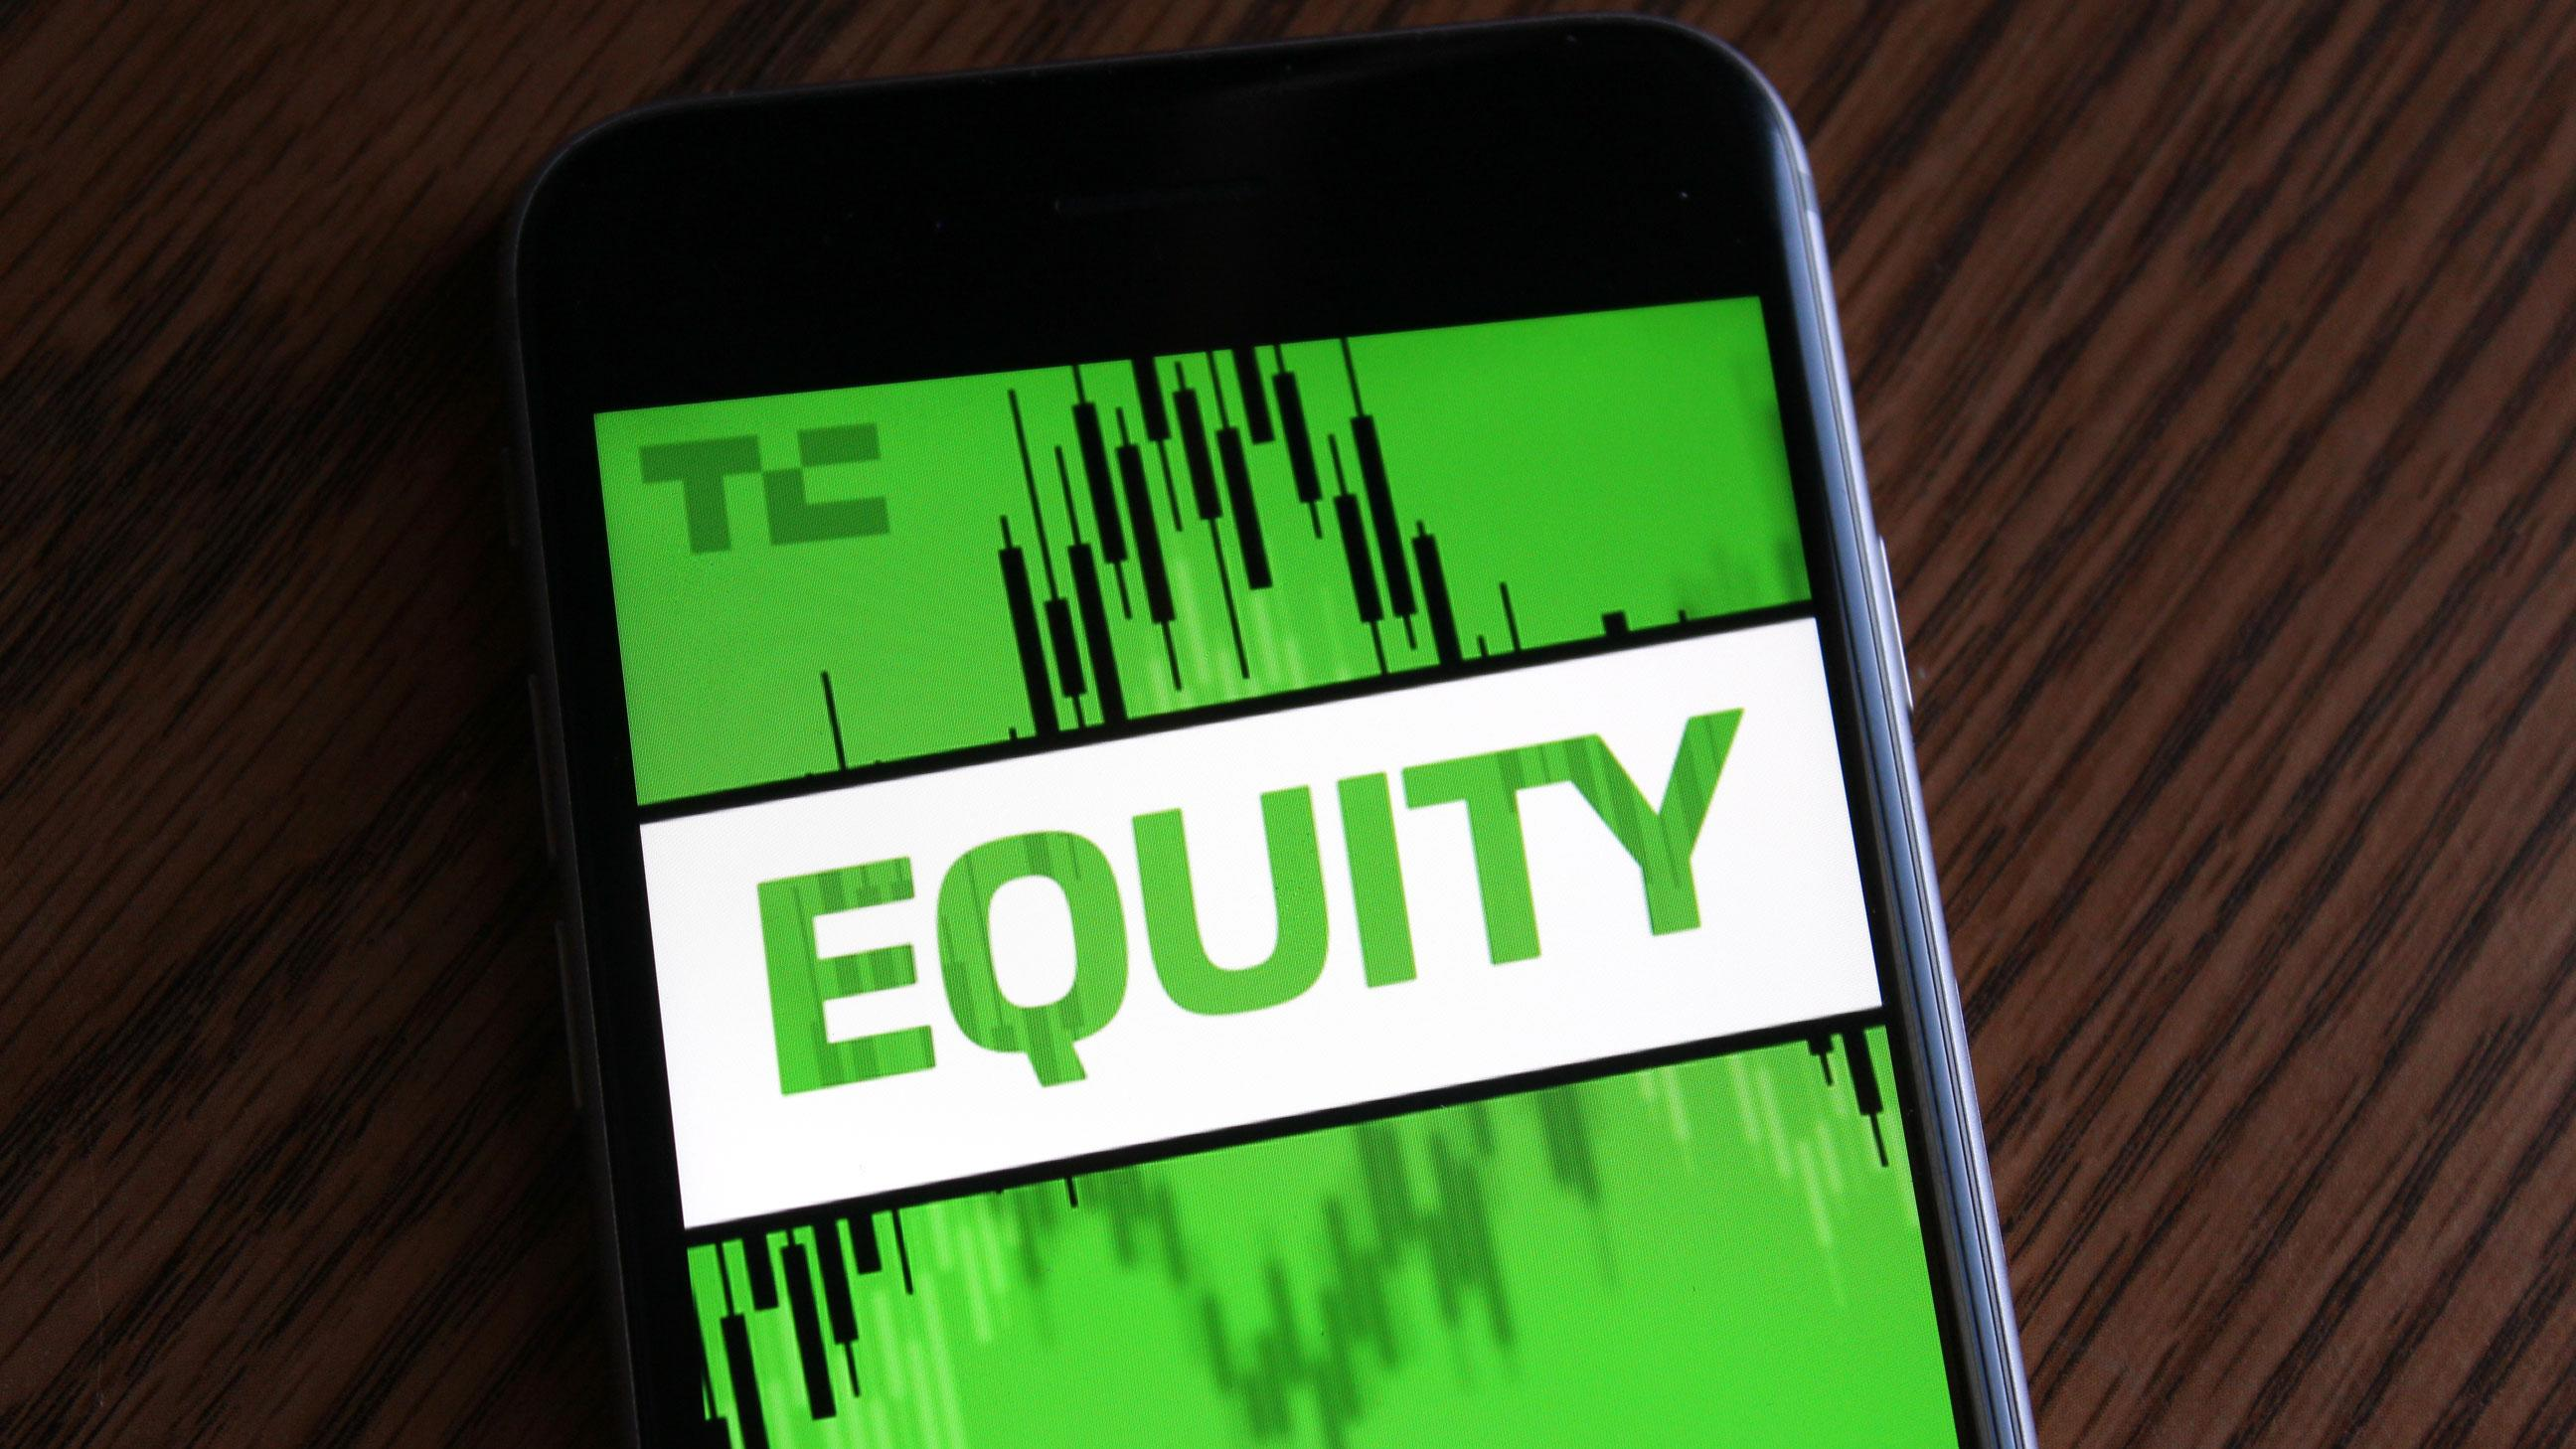 tc-equity-podcast-ios